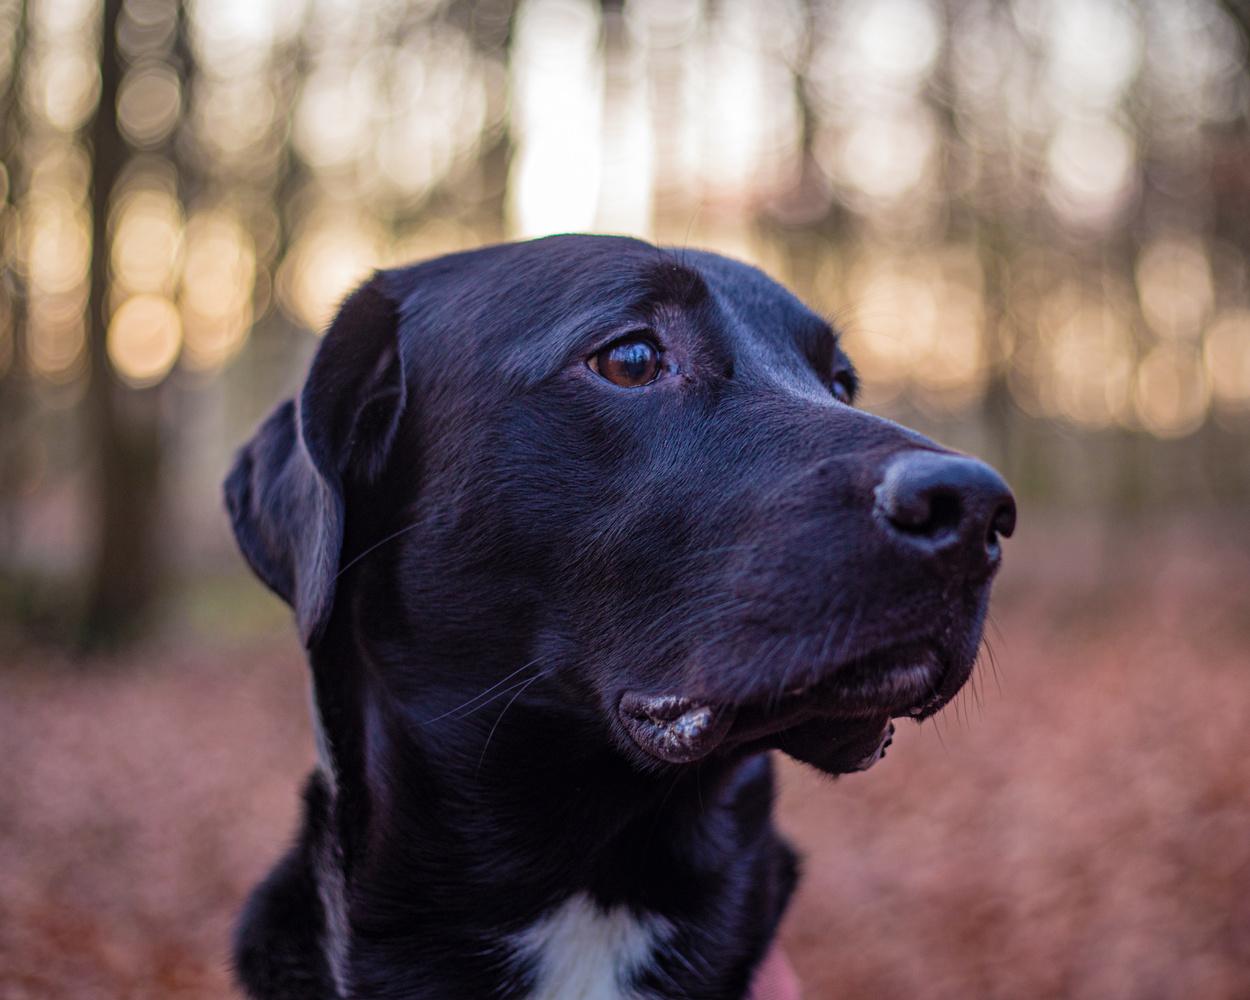 Tavi the Labrador by Sebastian Dannenberg